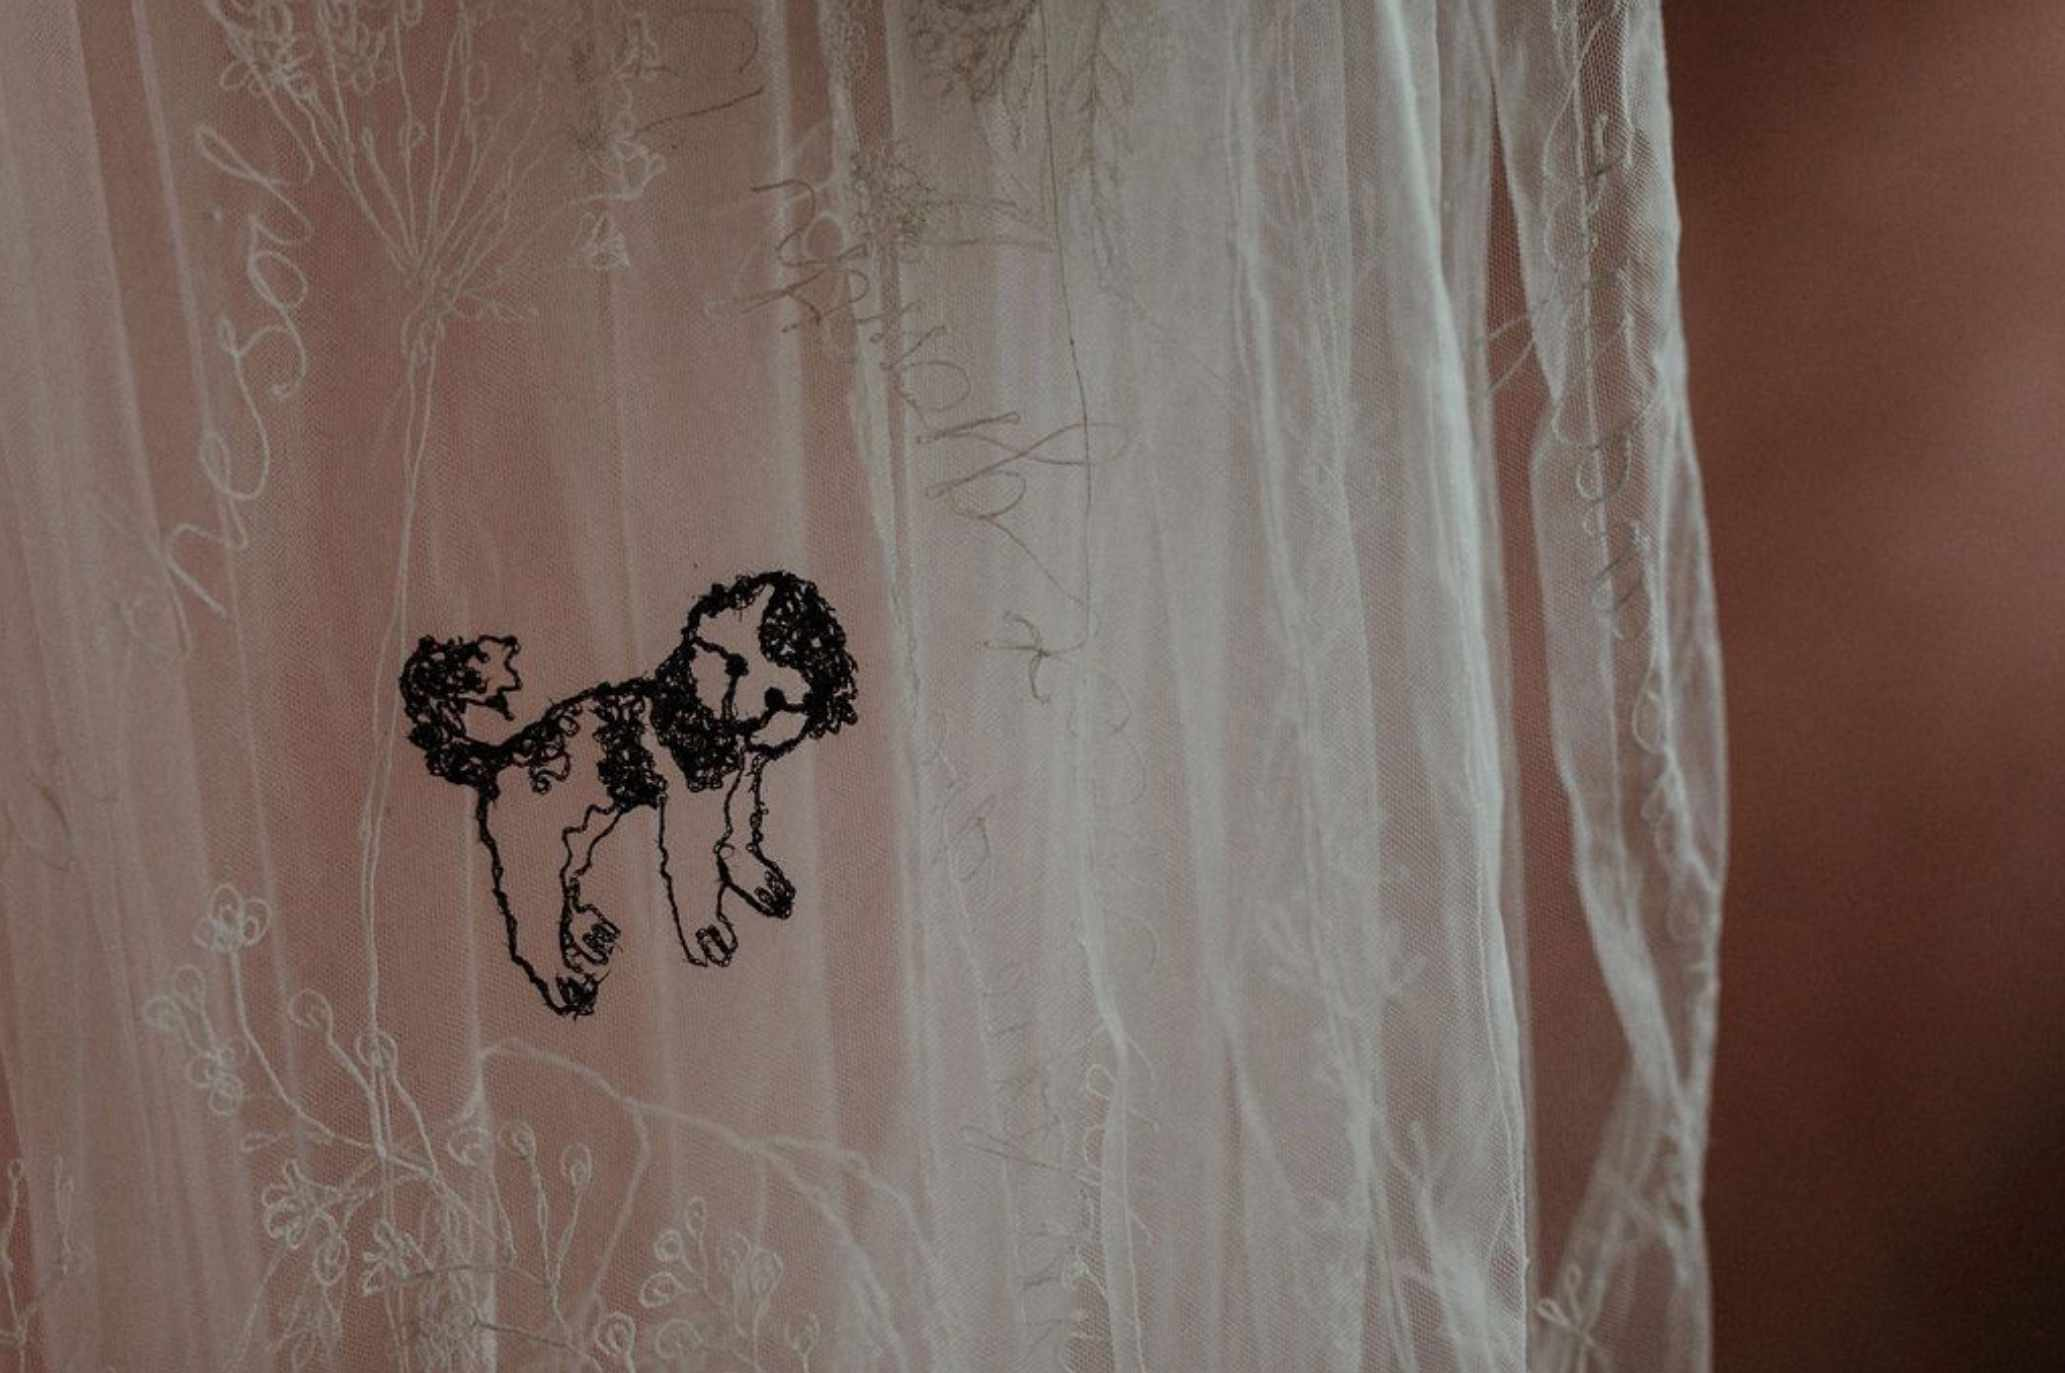 Dog embroidery on veil